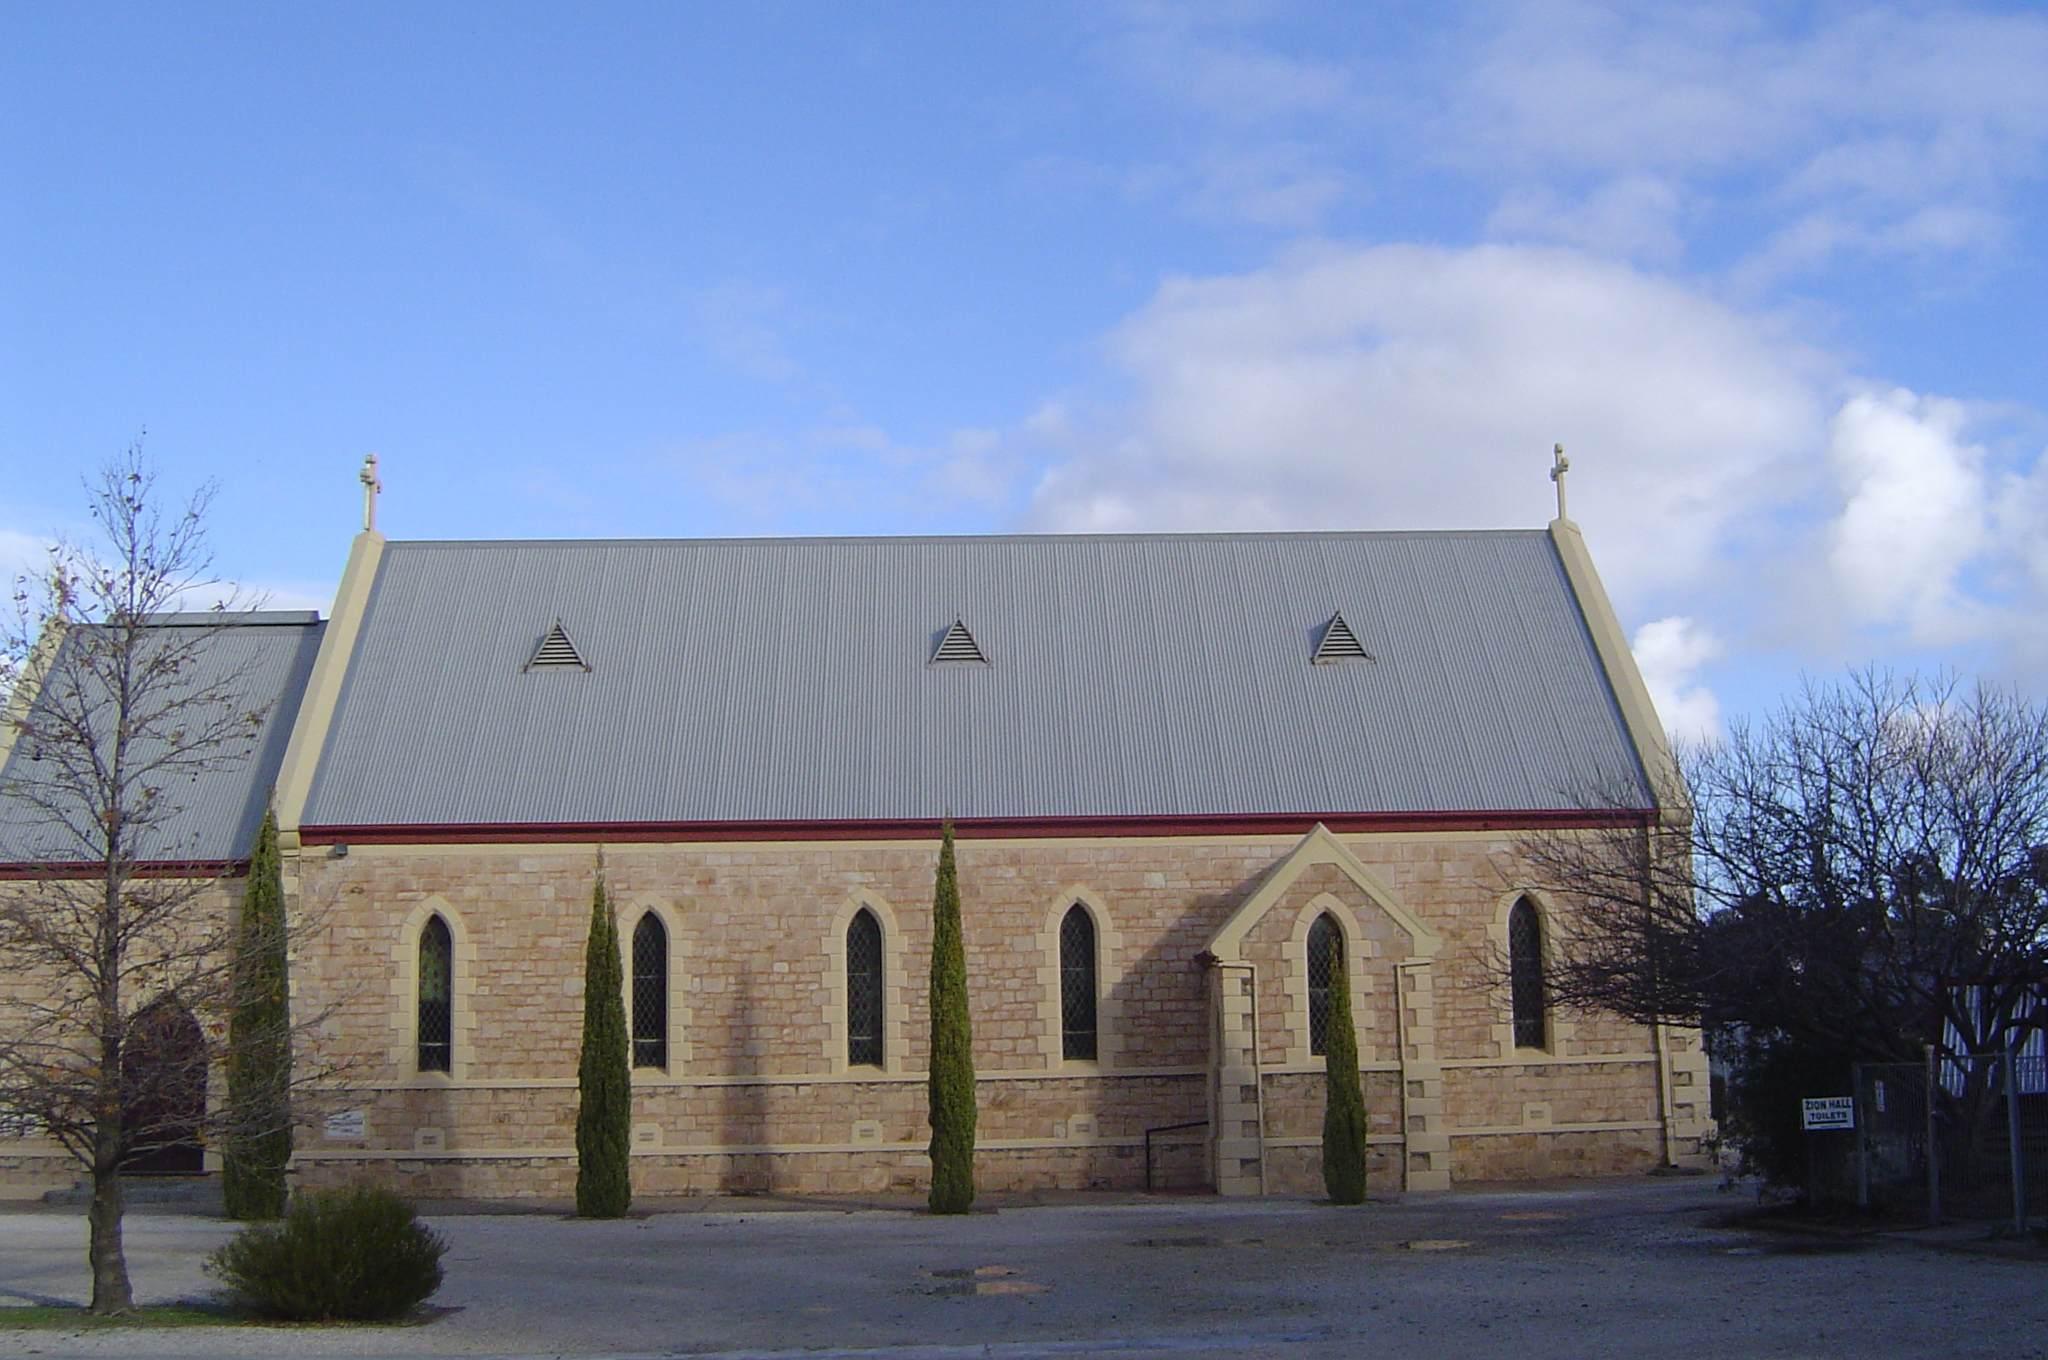 Gawler Australia  city photos gallery : Zion Lutheran Church 1922/23 , Gawler, South Australia